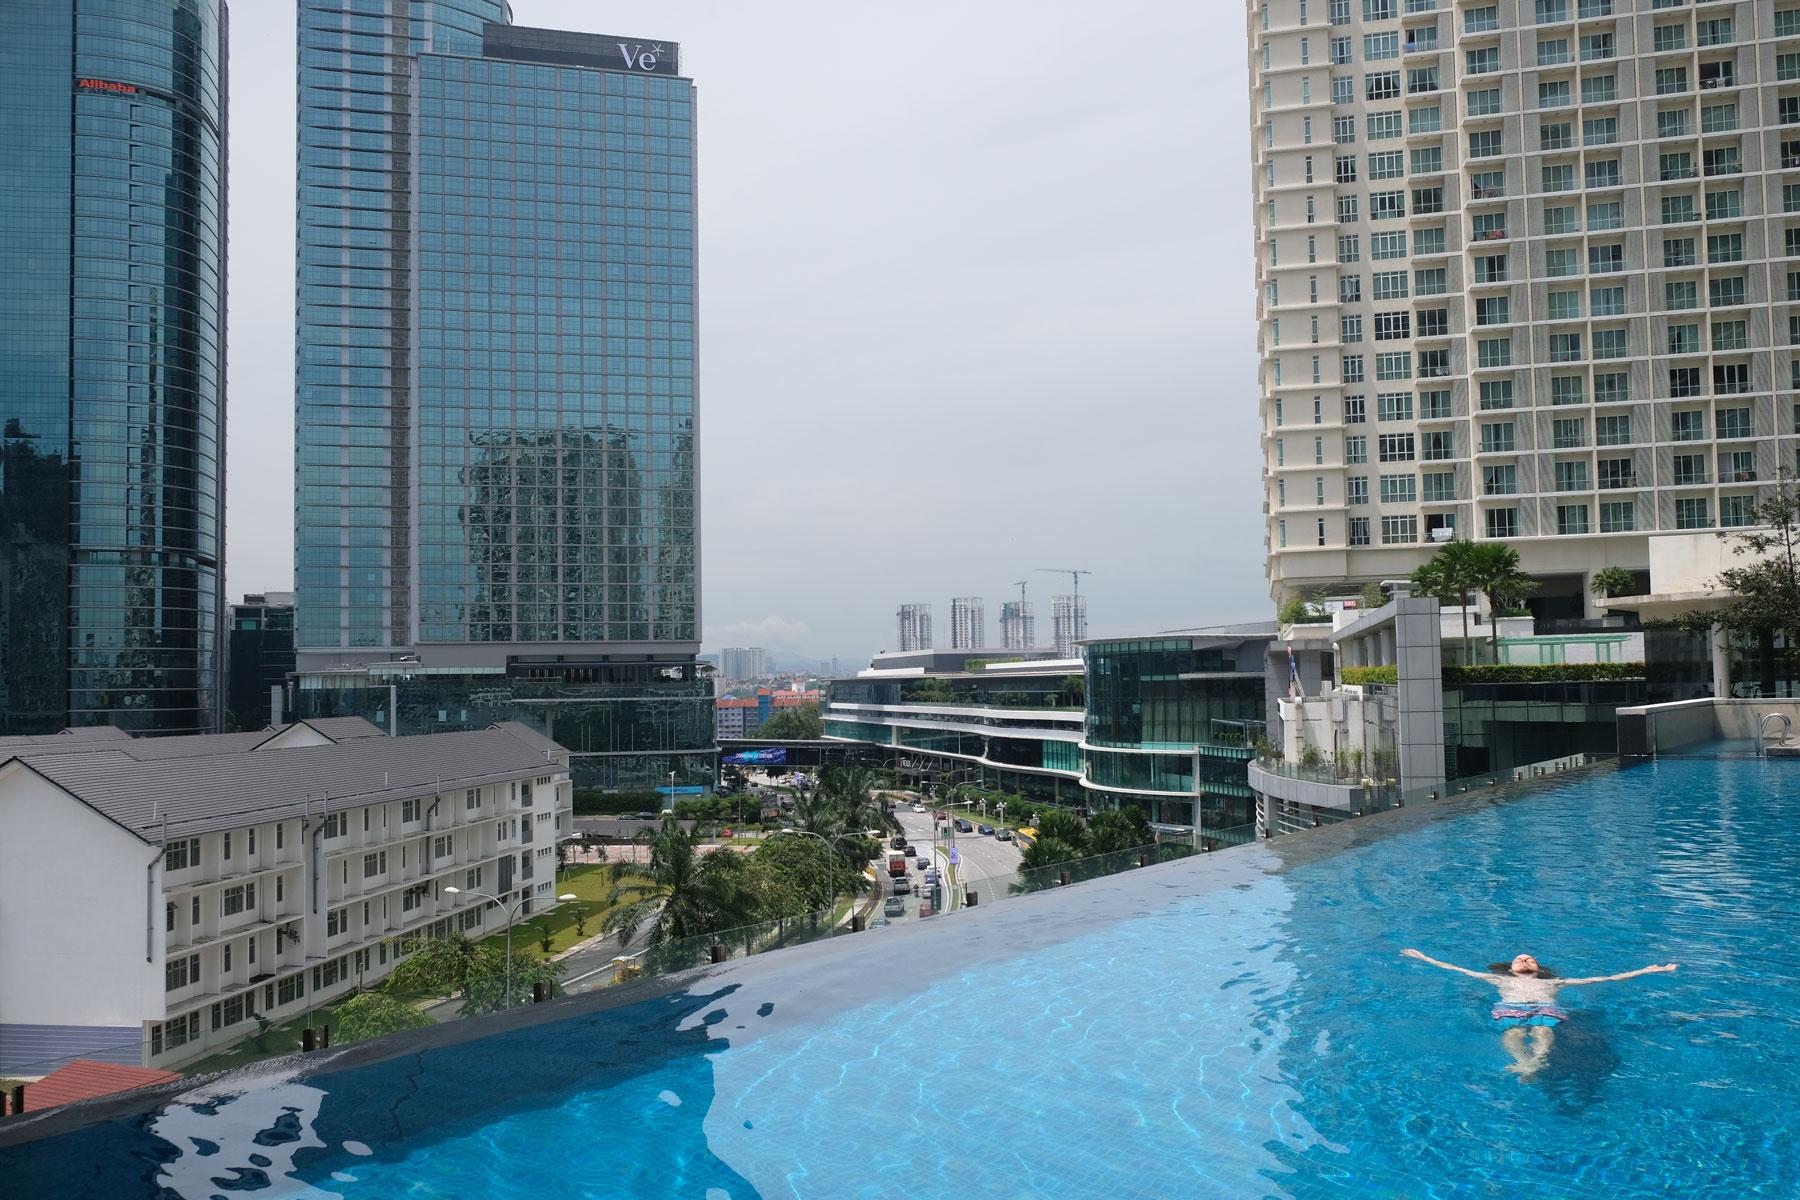 Sebastian schwimmt in einem Infinity Pool in Kuala Lumpur.